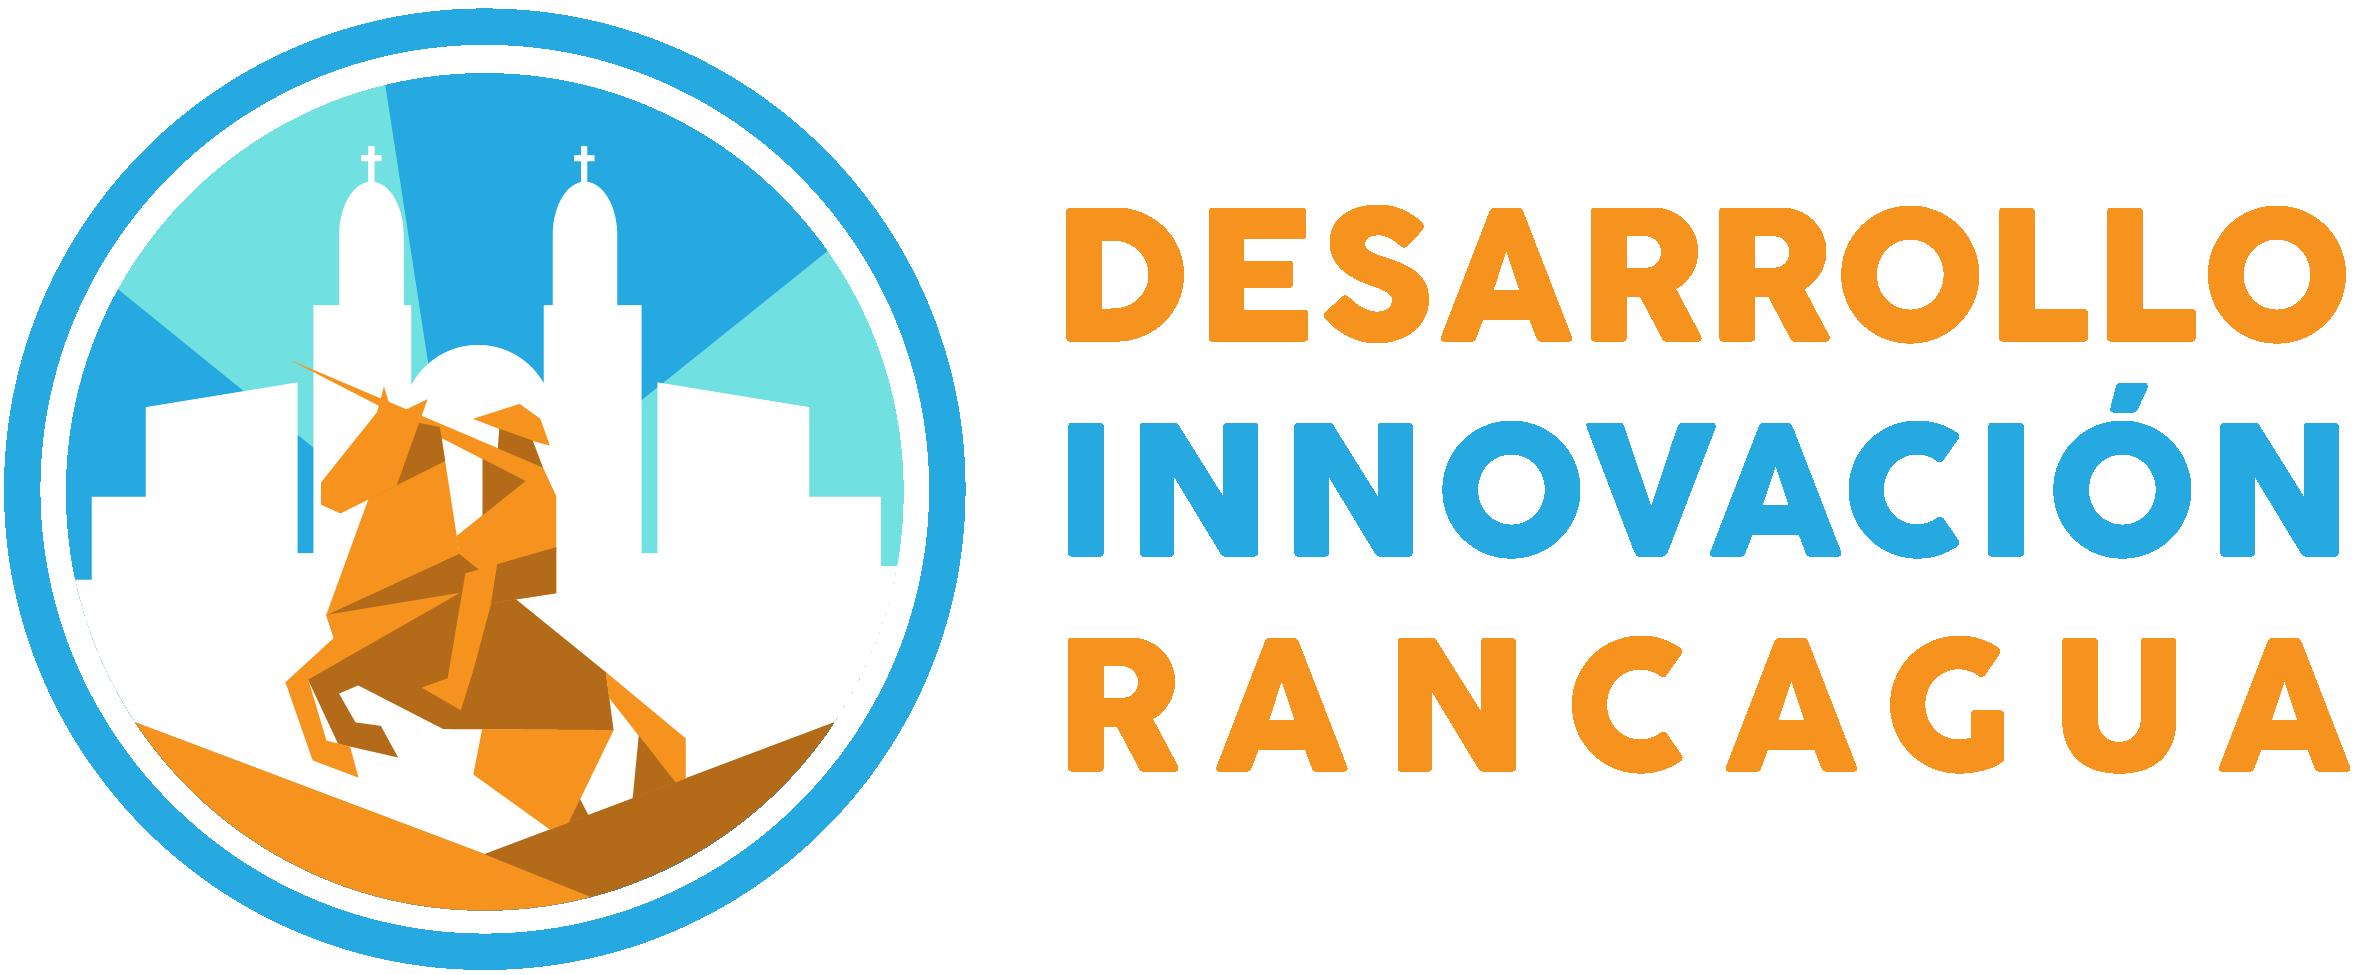 Desarrollo e Innovacion Rancagua